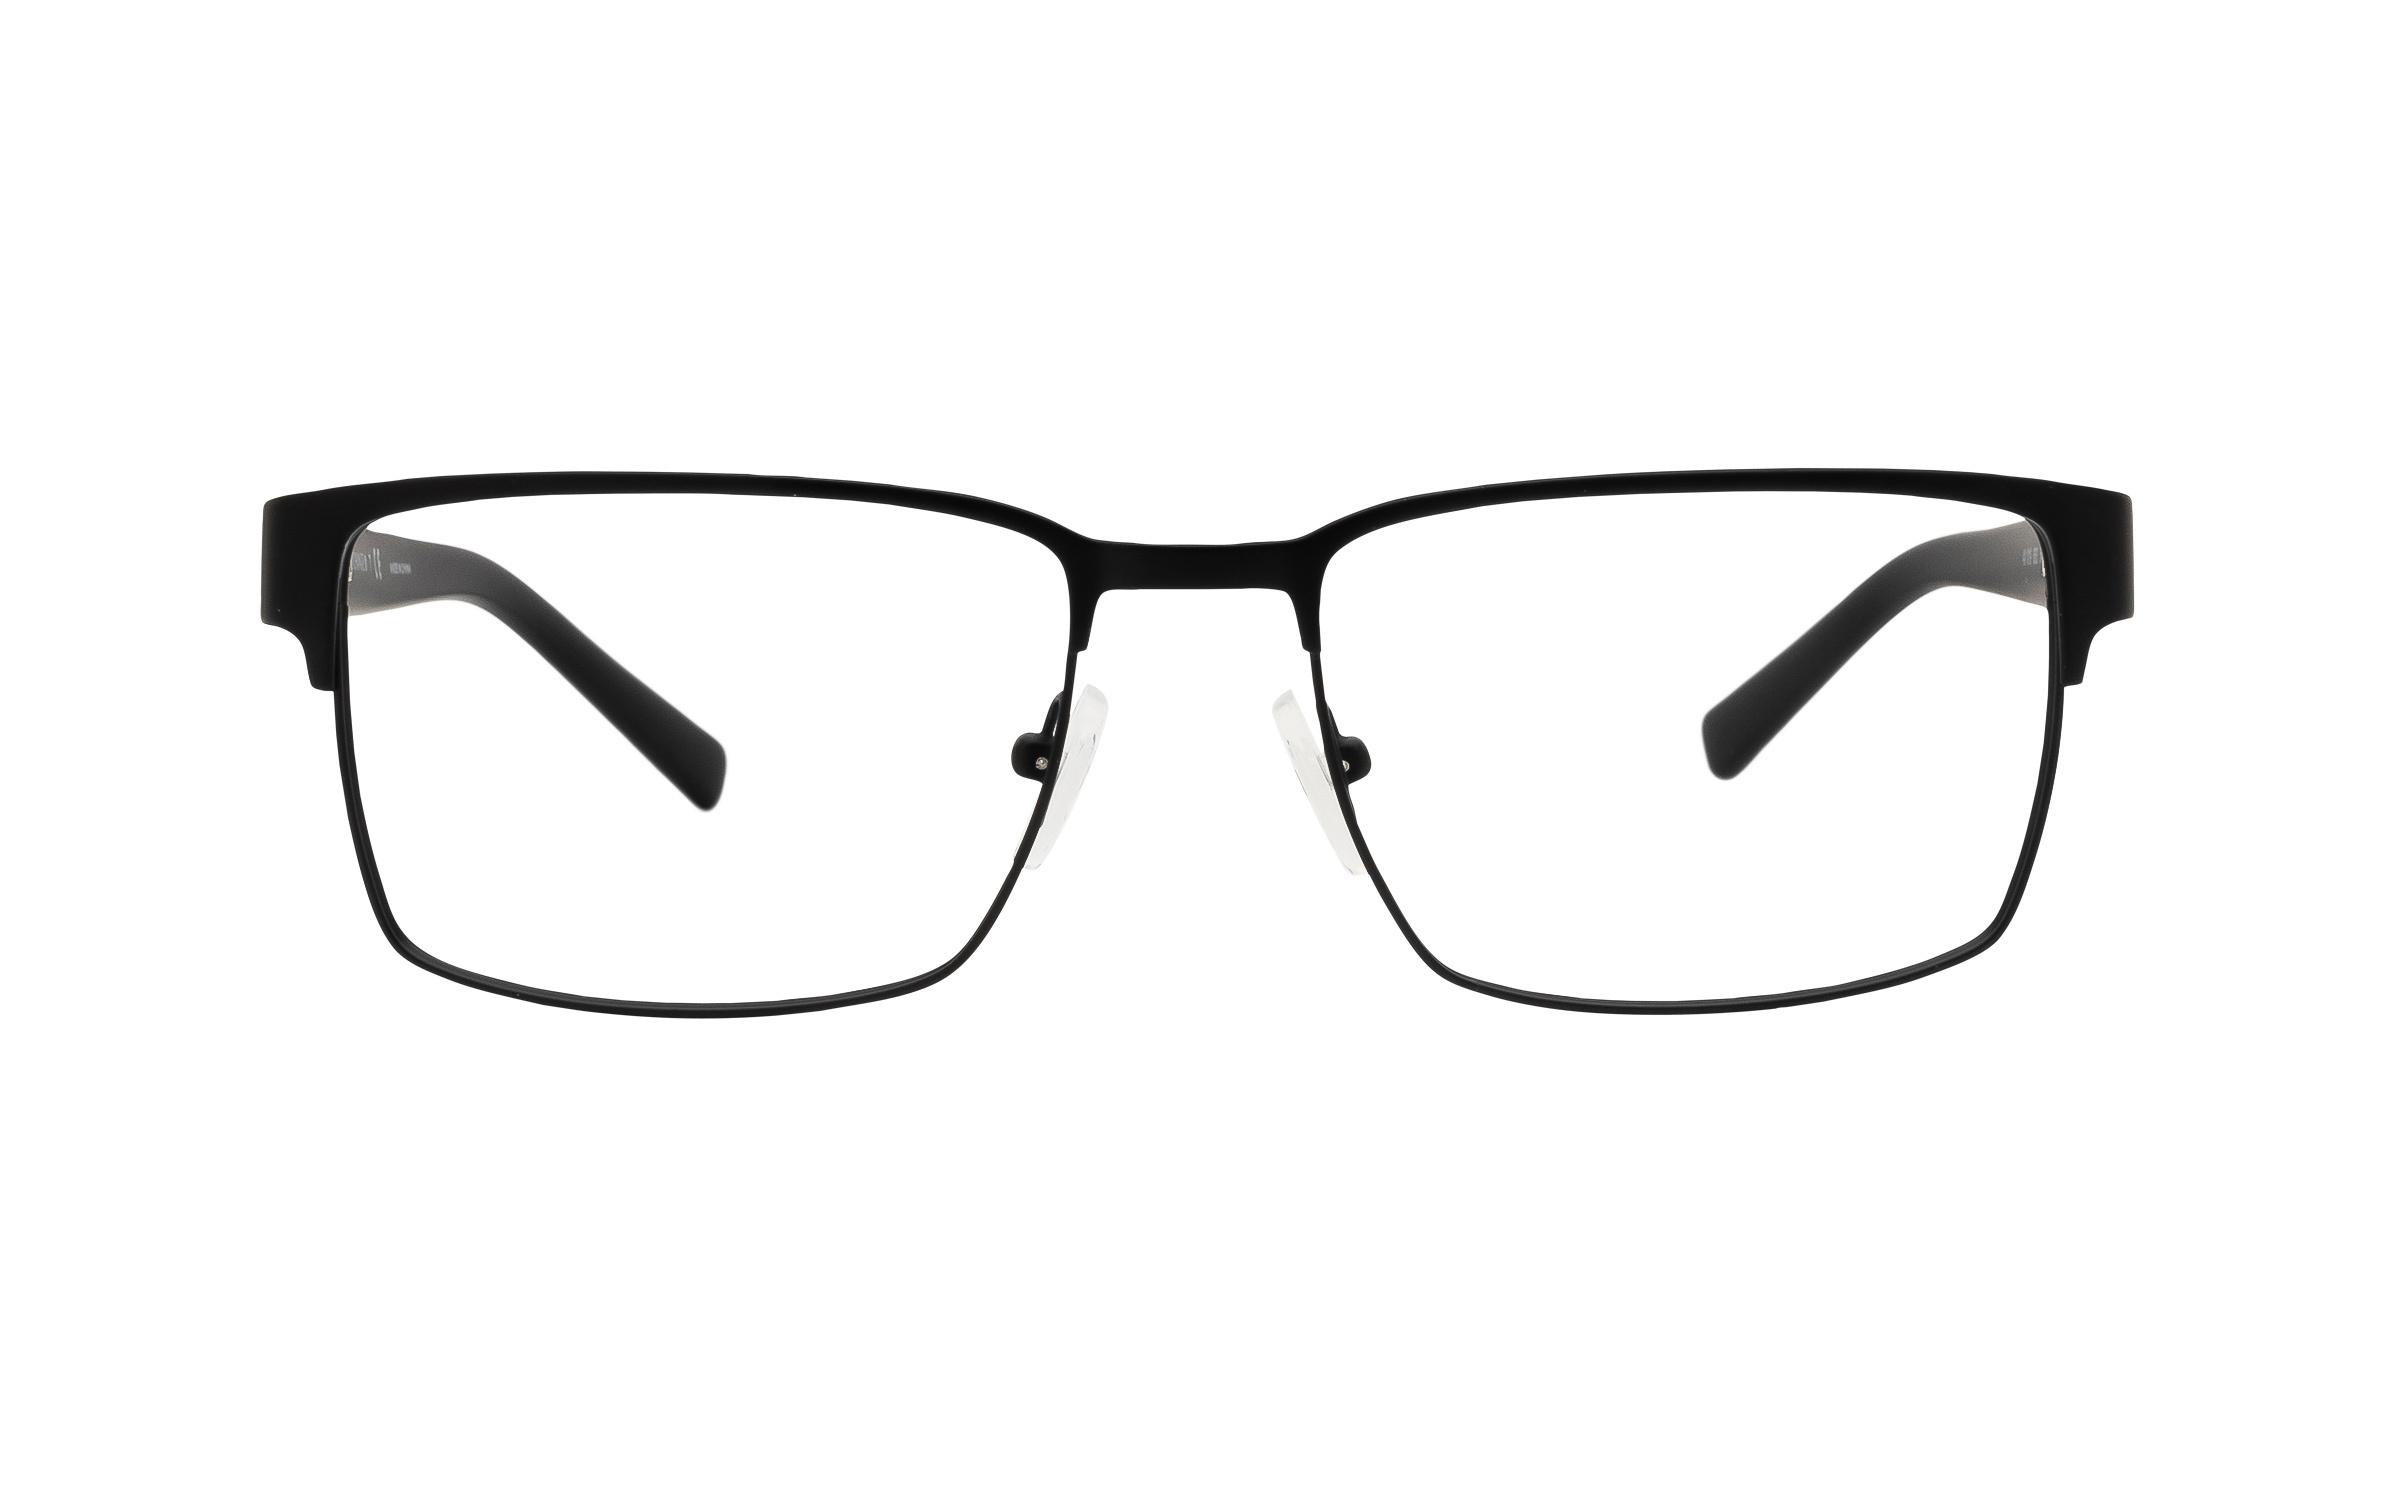 Armani Exchange AX1019 6063 (54) Eyeglasses and Frame in Matte Black | Acetate/Metal - Online Coastal